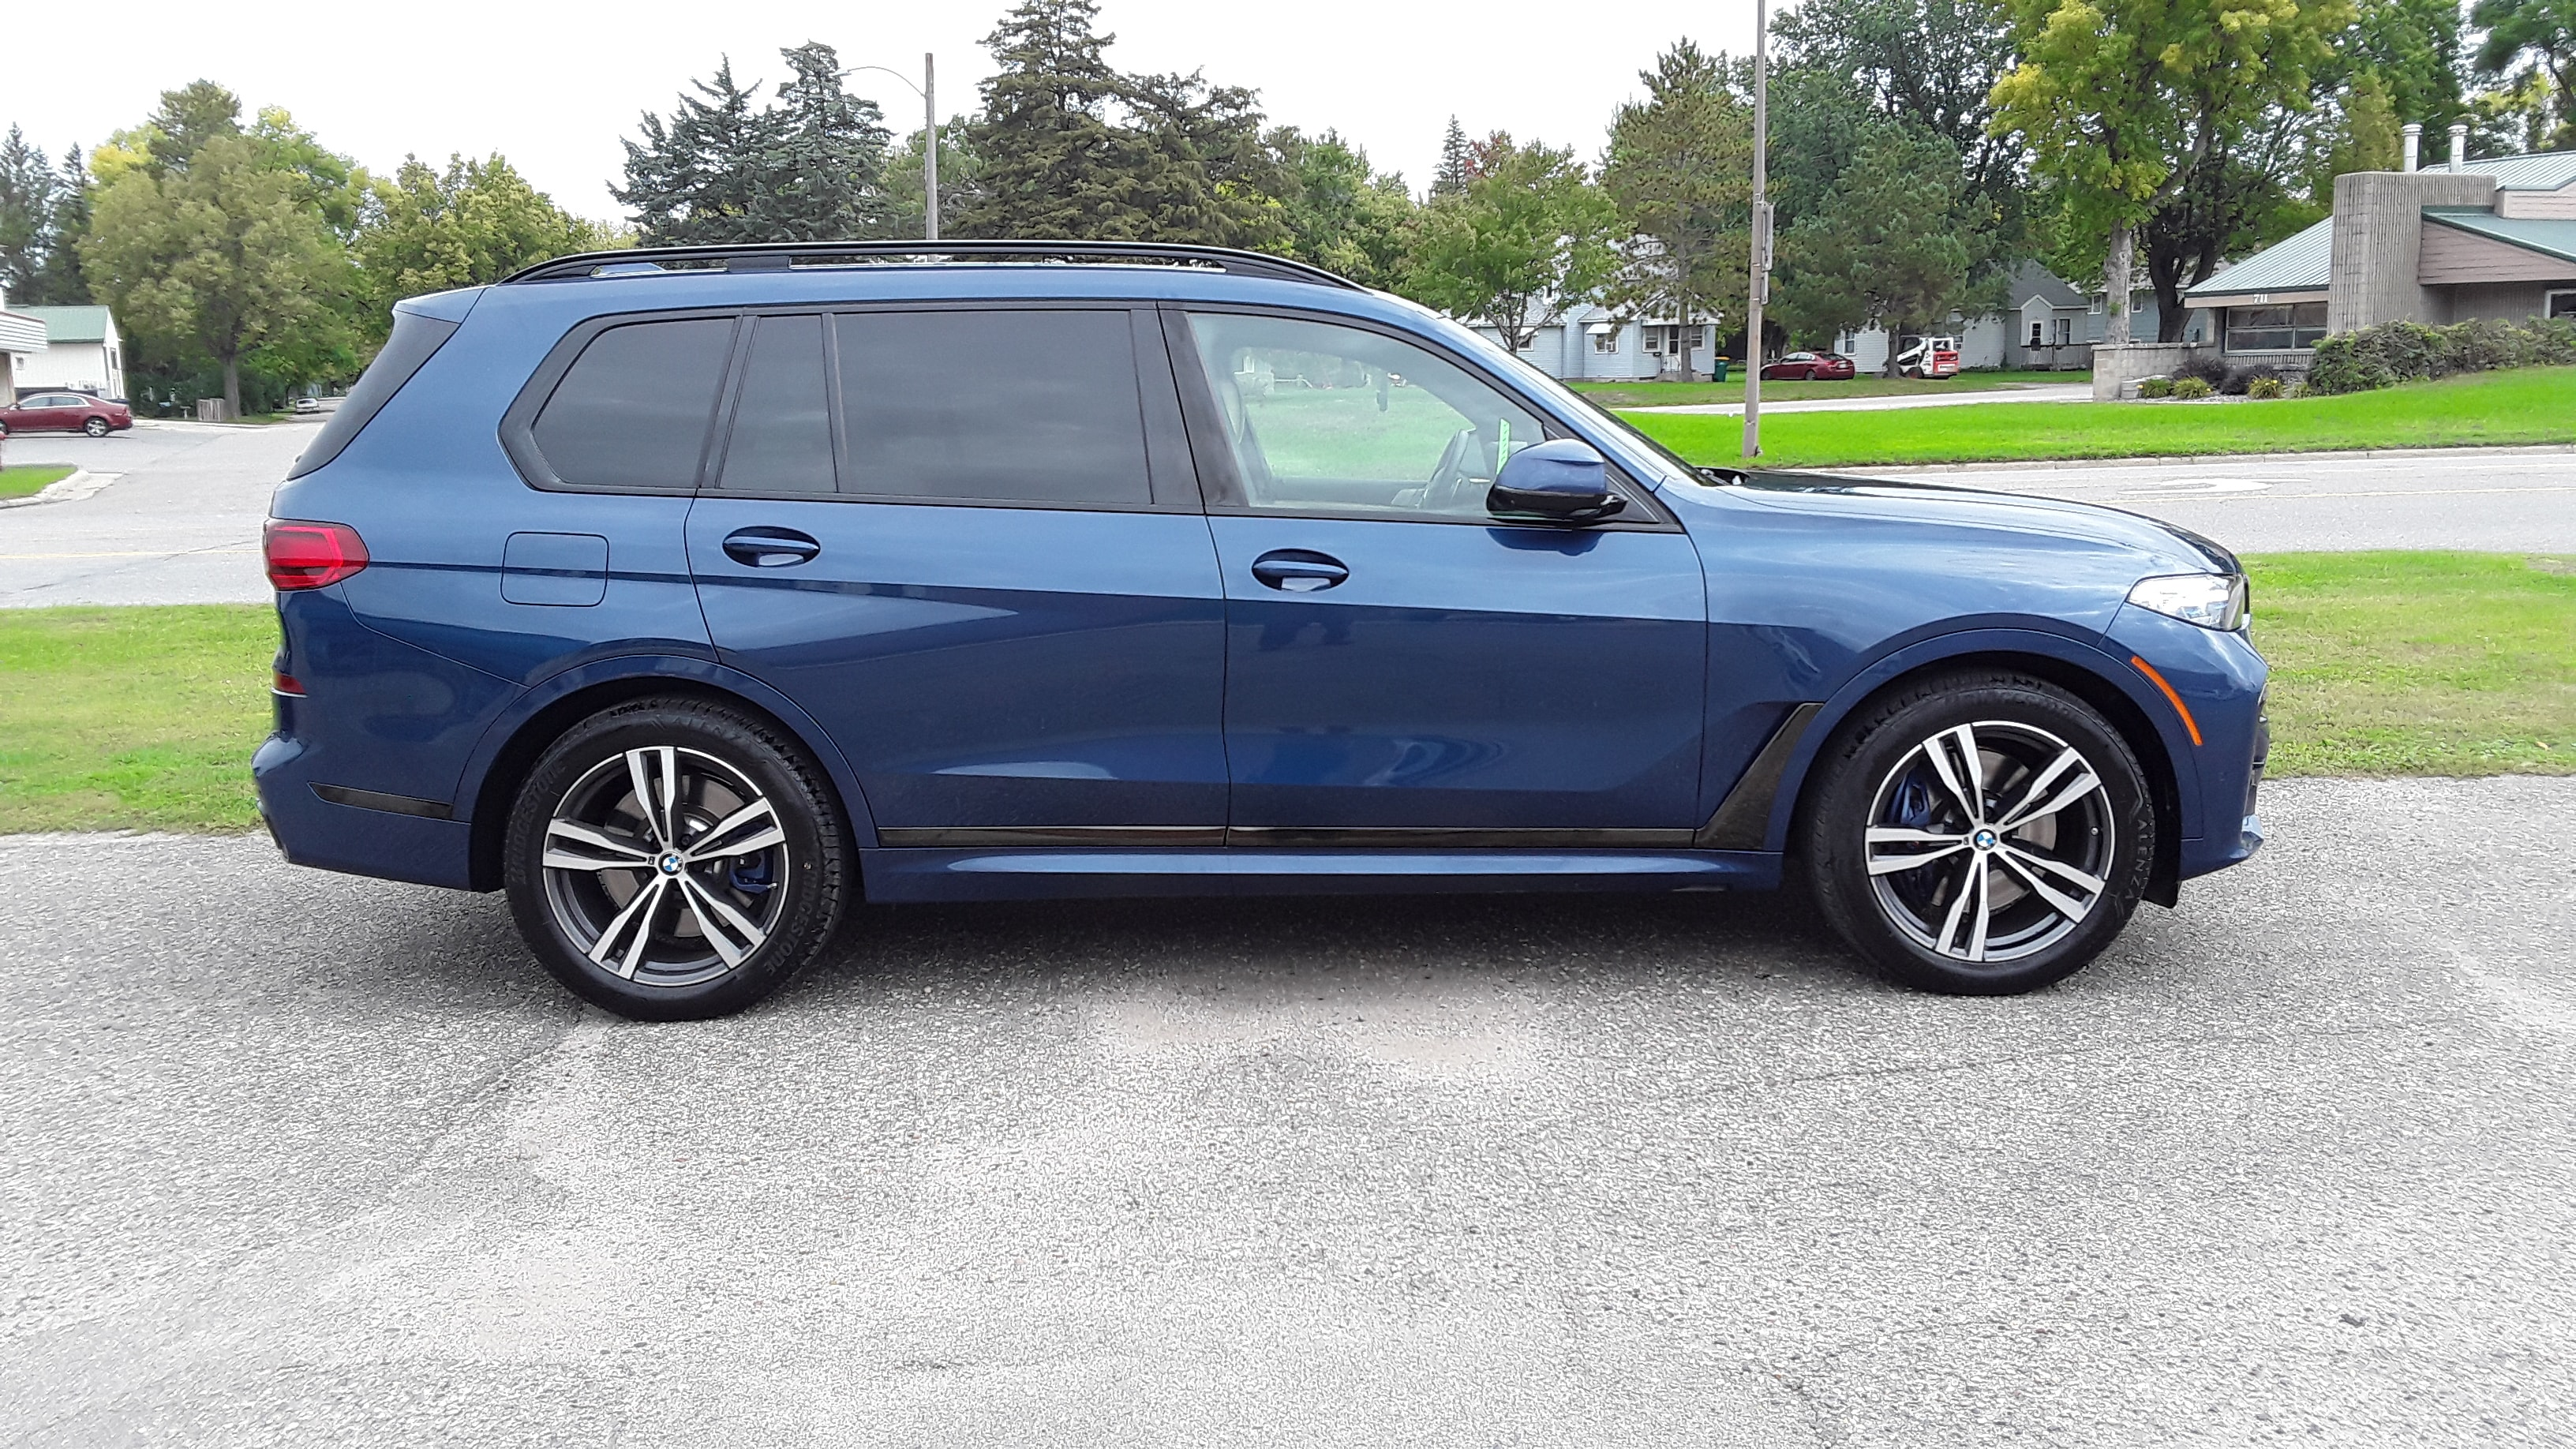 Used 2021 BMW X7 M50i with VIN 5UXCX6C00M9F14392 for sale in Litchfield, Minnesota